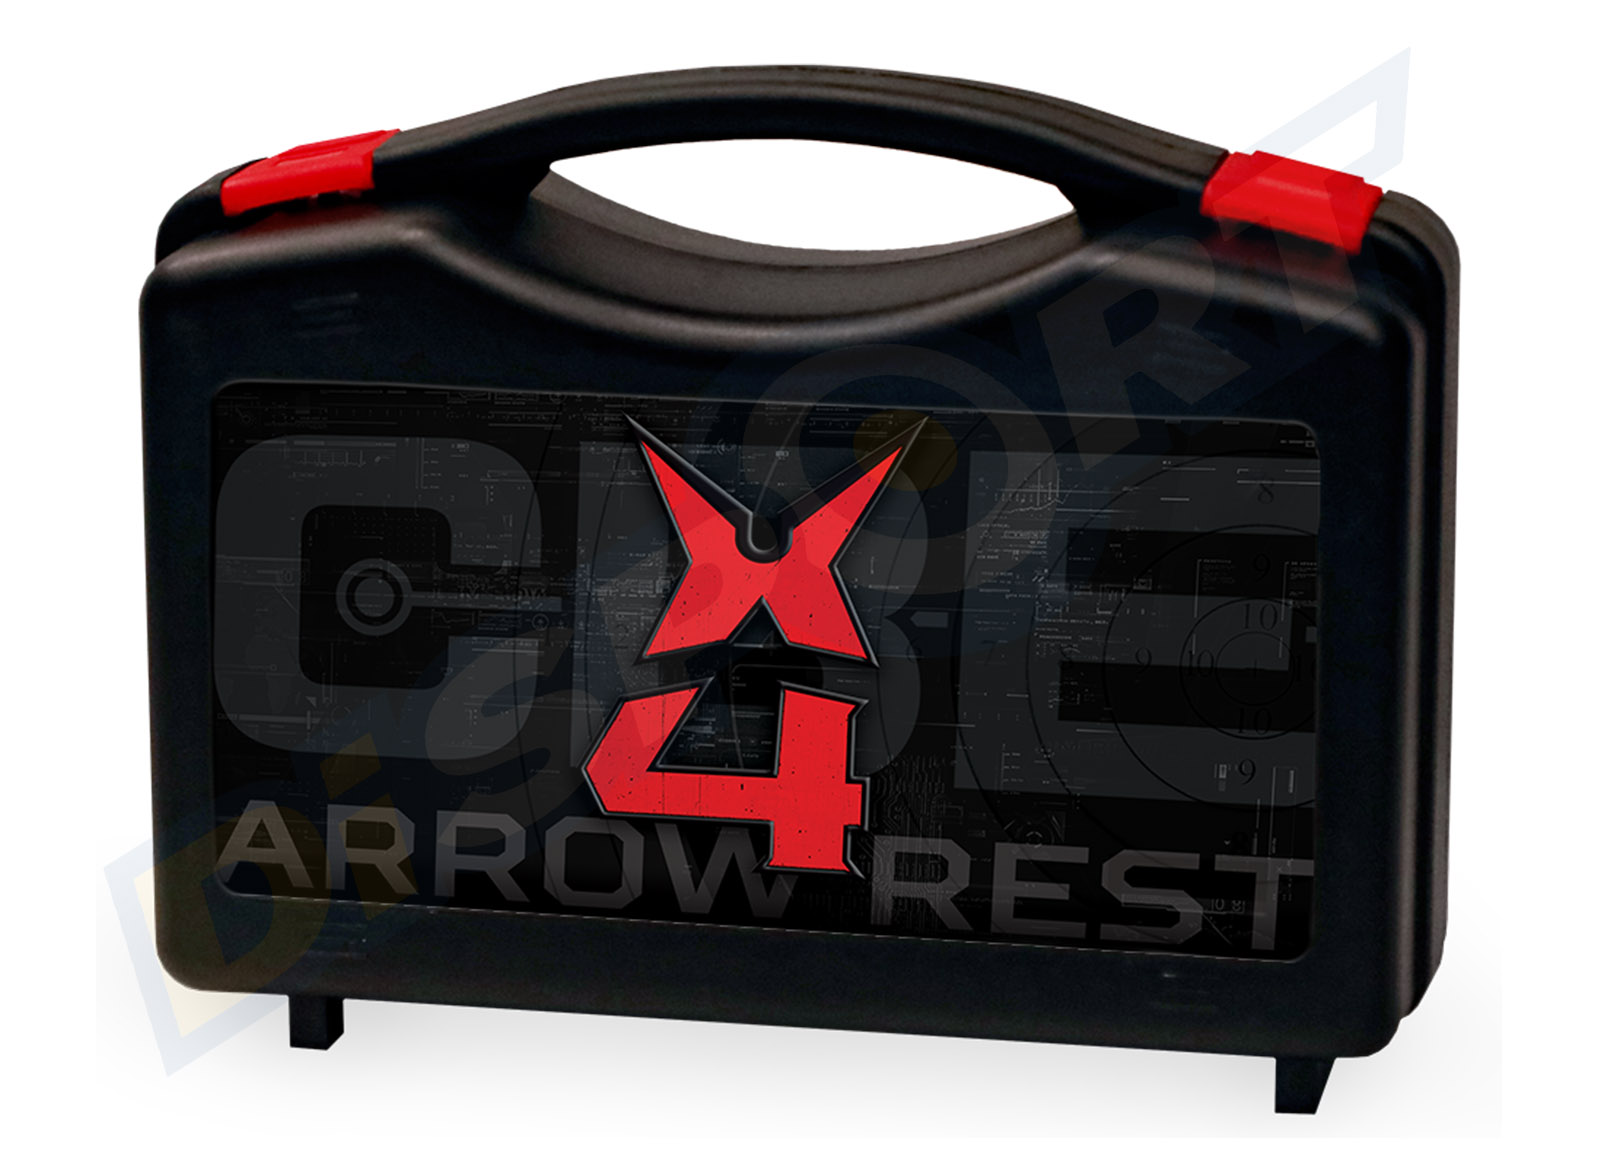 CBE COMPOUND ARROW REST X4